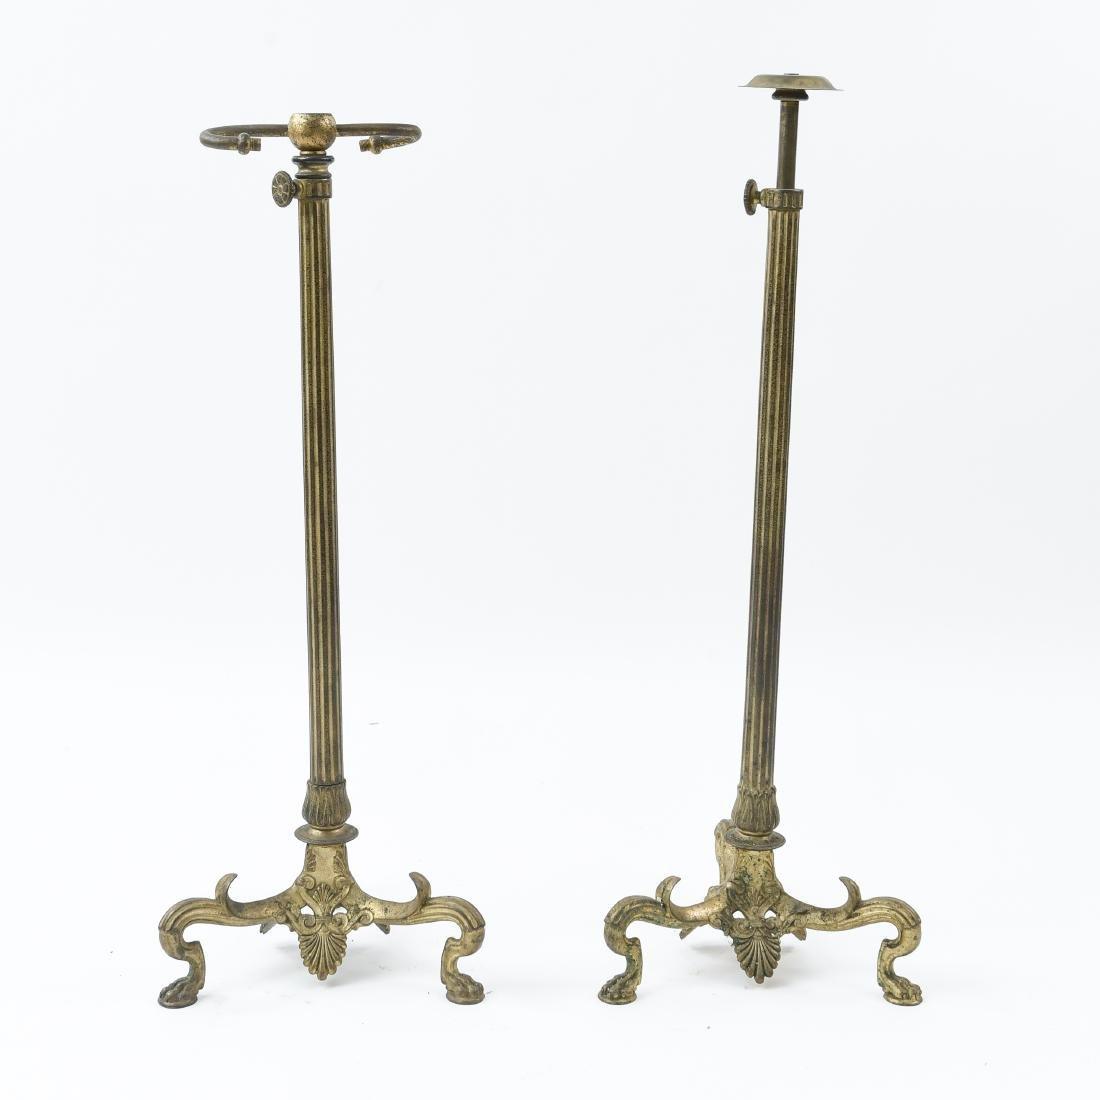 PAIR OF TIFFANY STUDIOS FLOOR OR BANQUET LAMPS